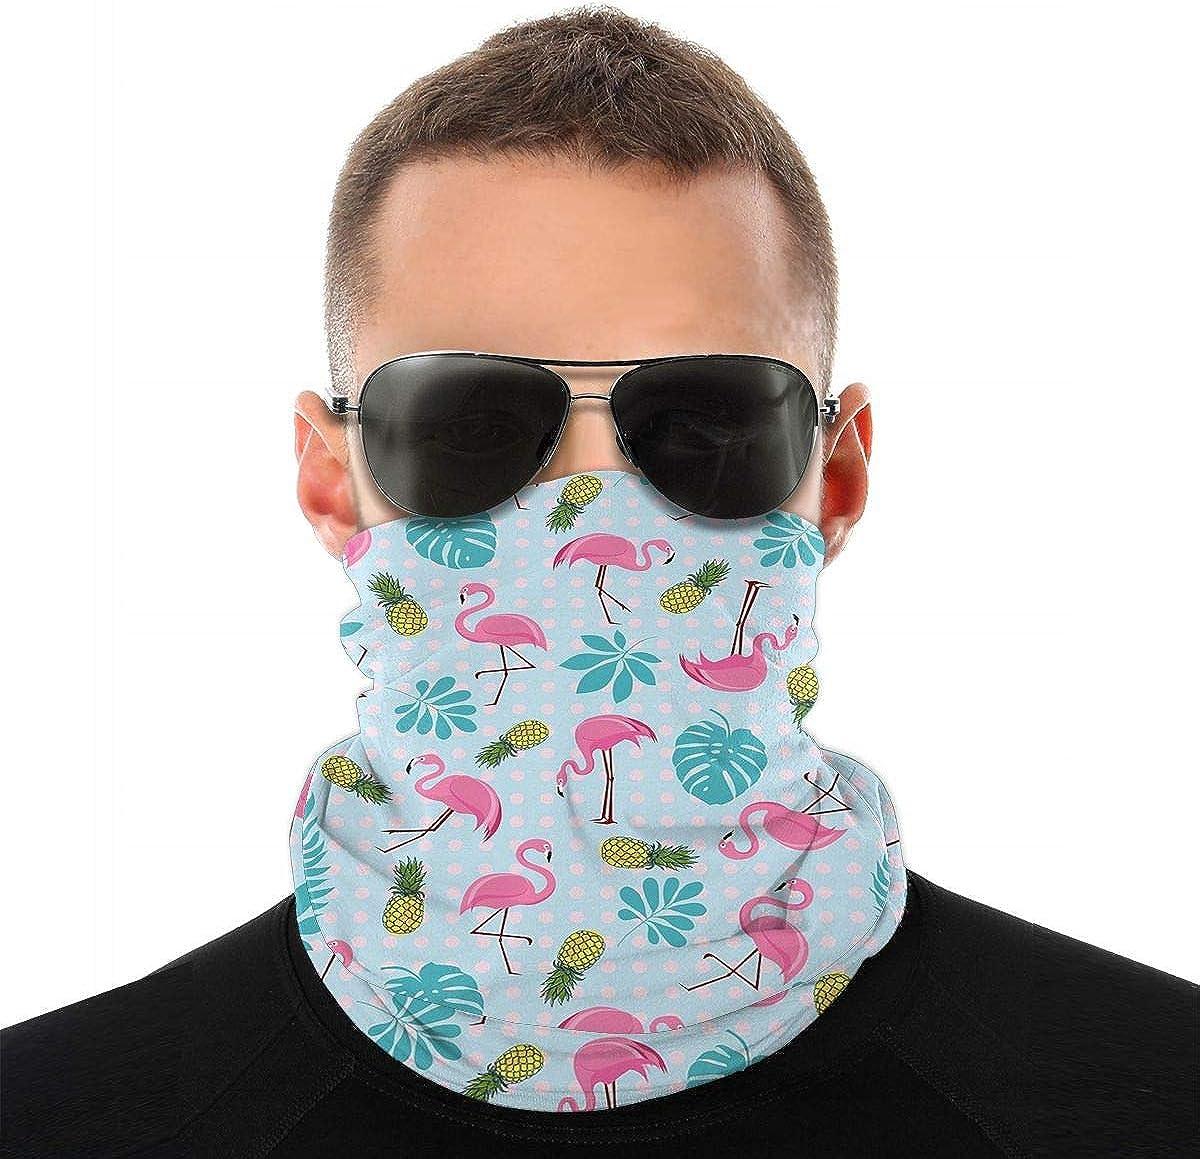 KiuLoam Flamingo and Pineapple Seamless Face Mask Bandanas Neck Gaiter for Men and Women, Multifunction Headband Scarf for Dust, Outdoors, Sports